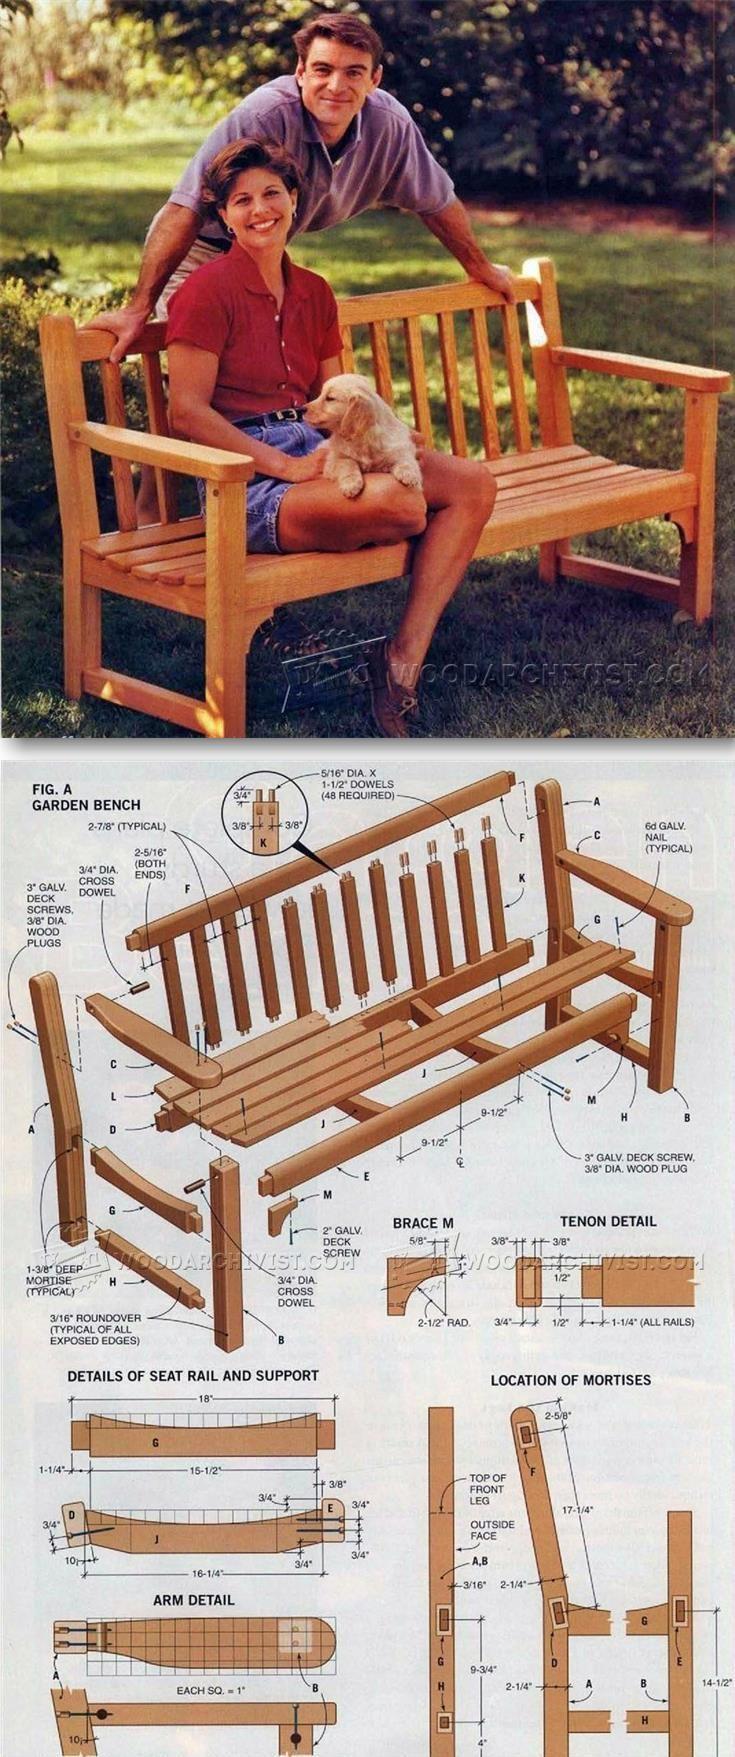 Garden Bench Plans Outdoor Furniture Plans And Projects Woodarchivist Com Planos De Carpinteria Planos De Muebles Proyectos De Carpinteria